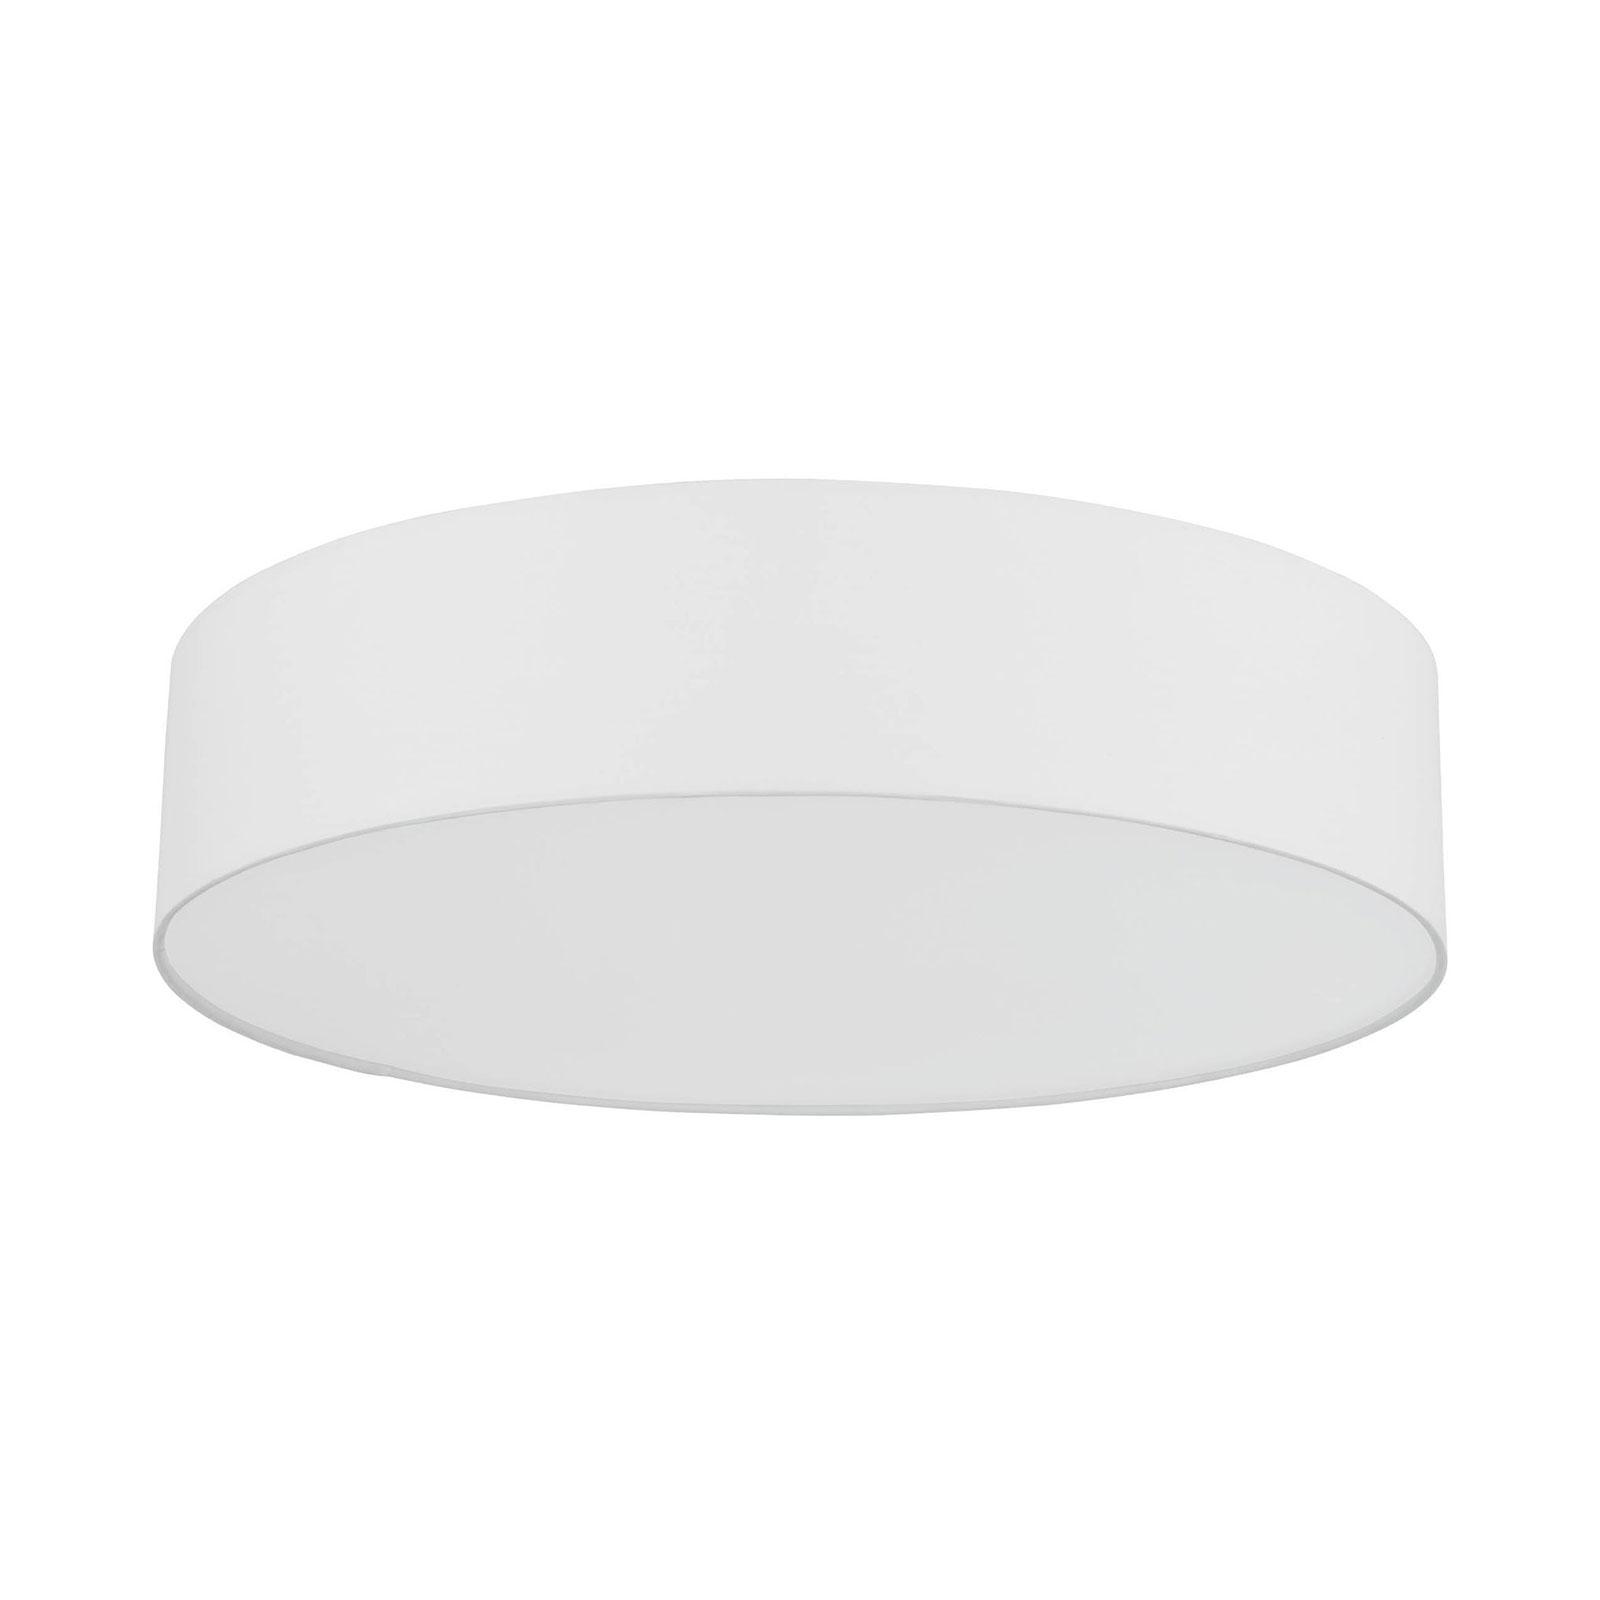 EGLO connect Ramao-C LED-Deckenlampe weiß 57cm